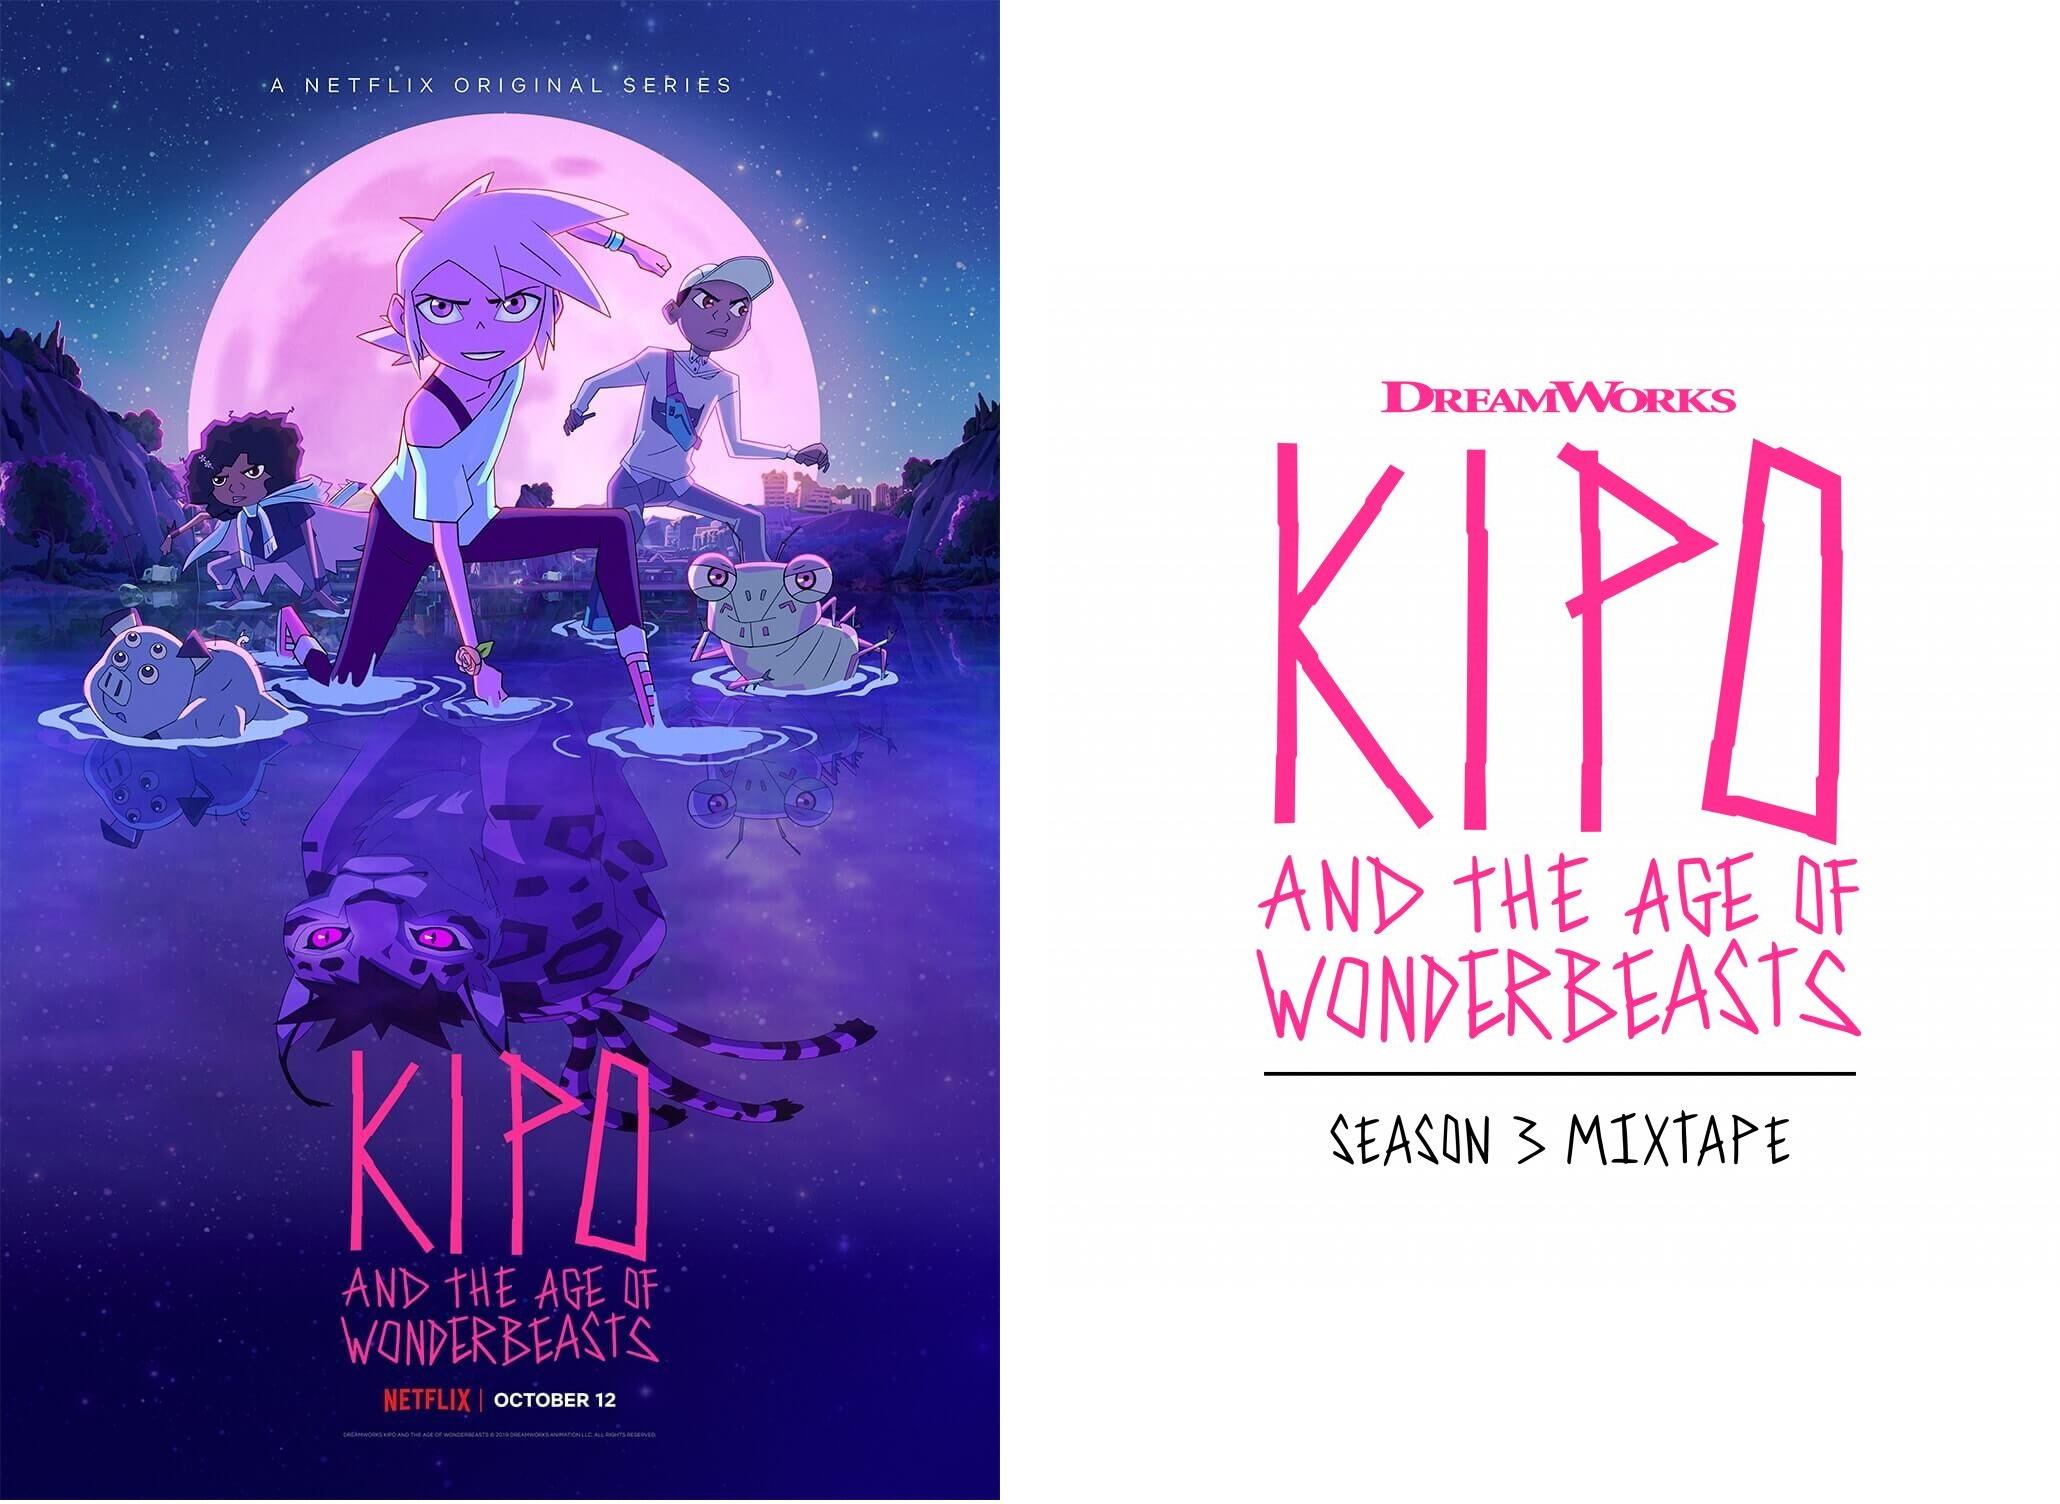 Kipo and the Age of Wonderbeasts (Season 3)